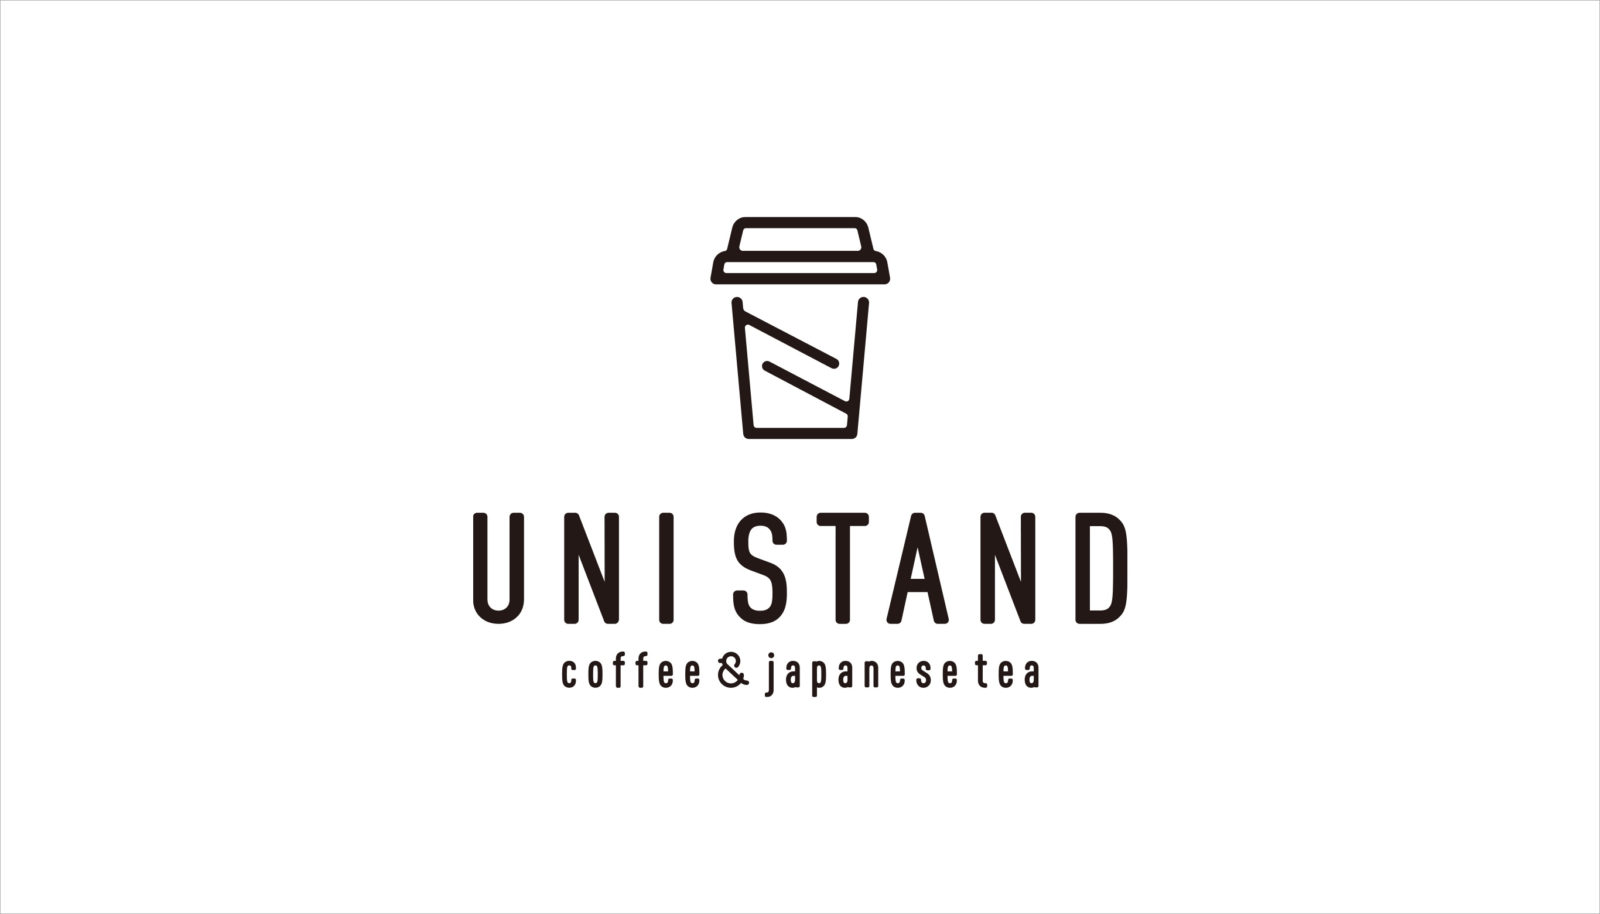 UNISTAND / トータルブランディング